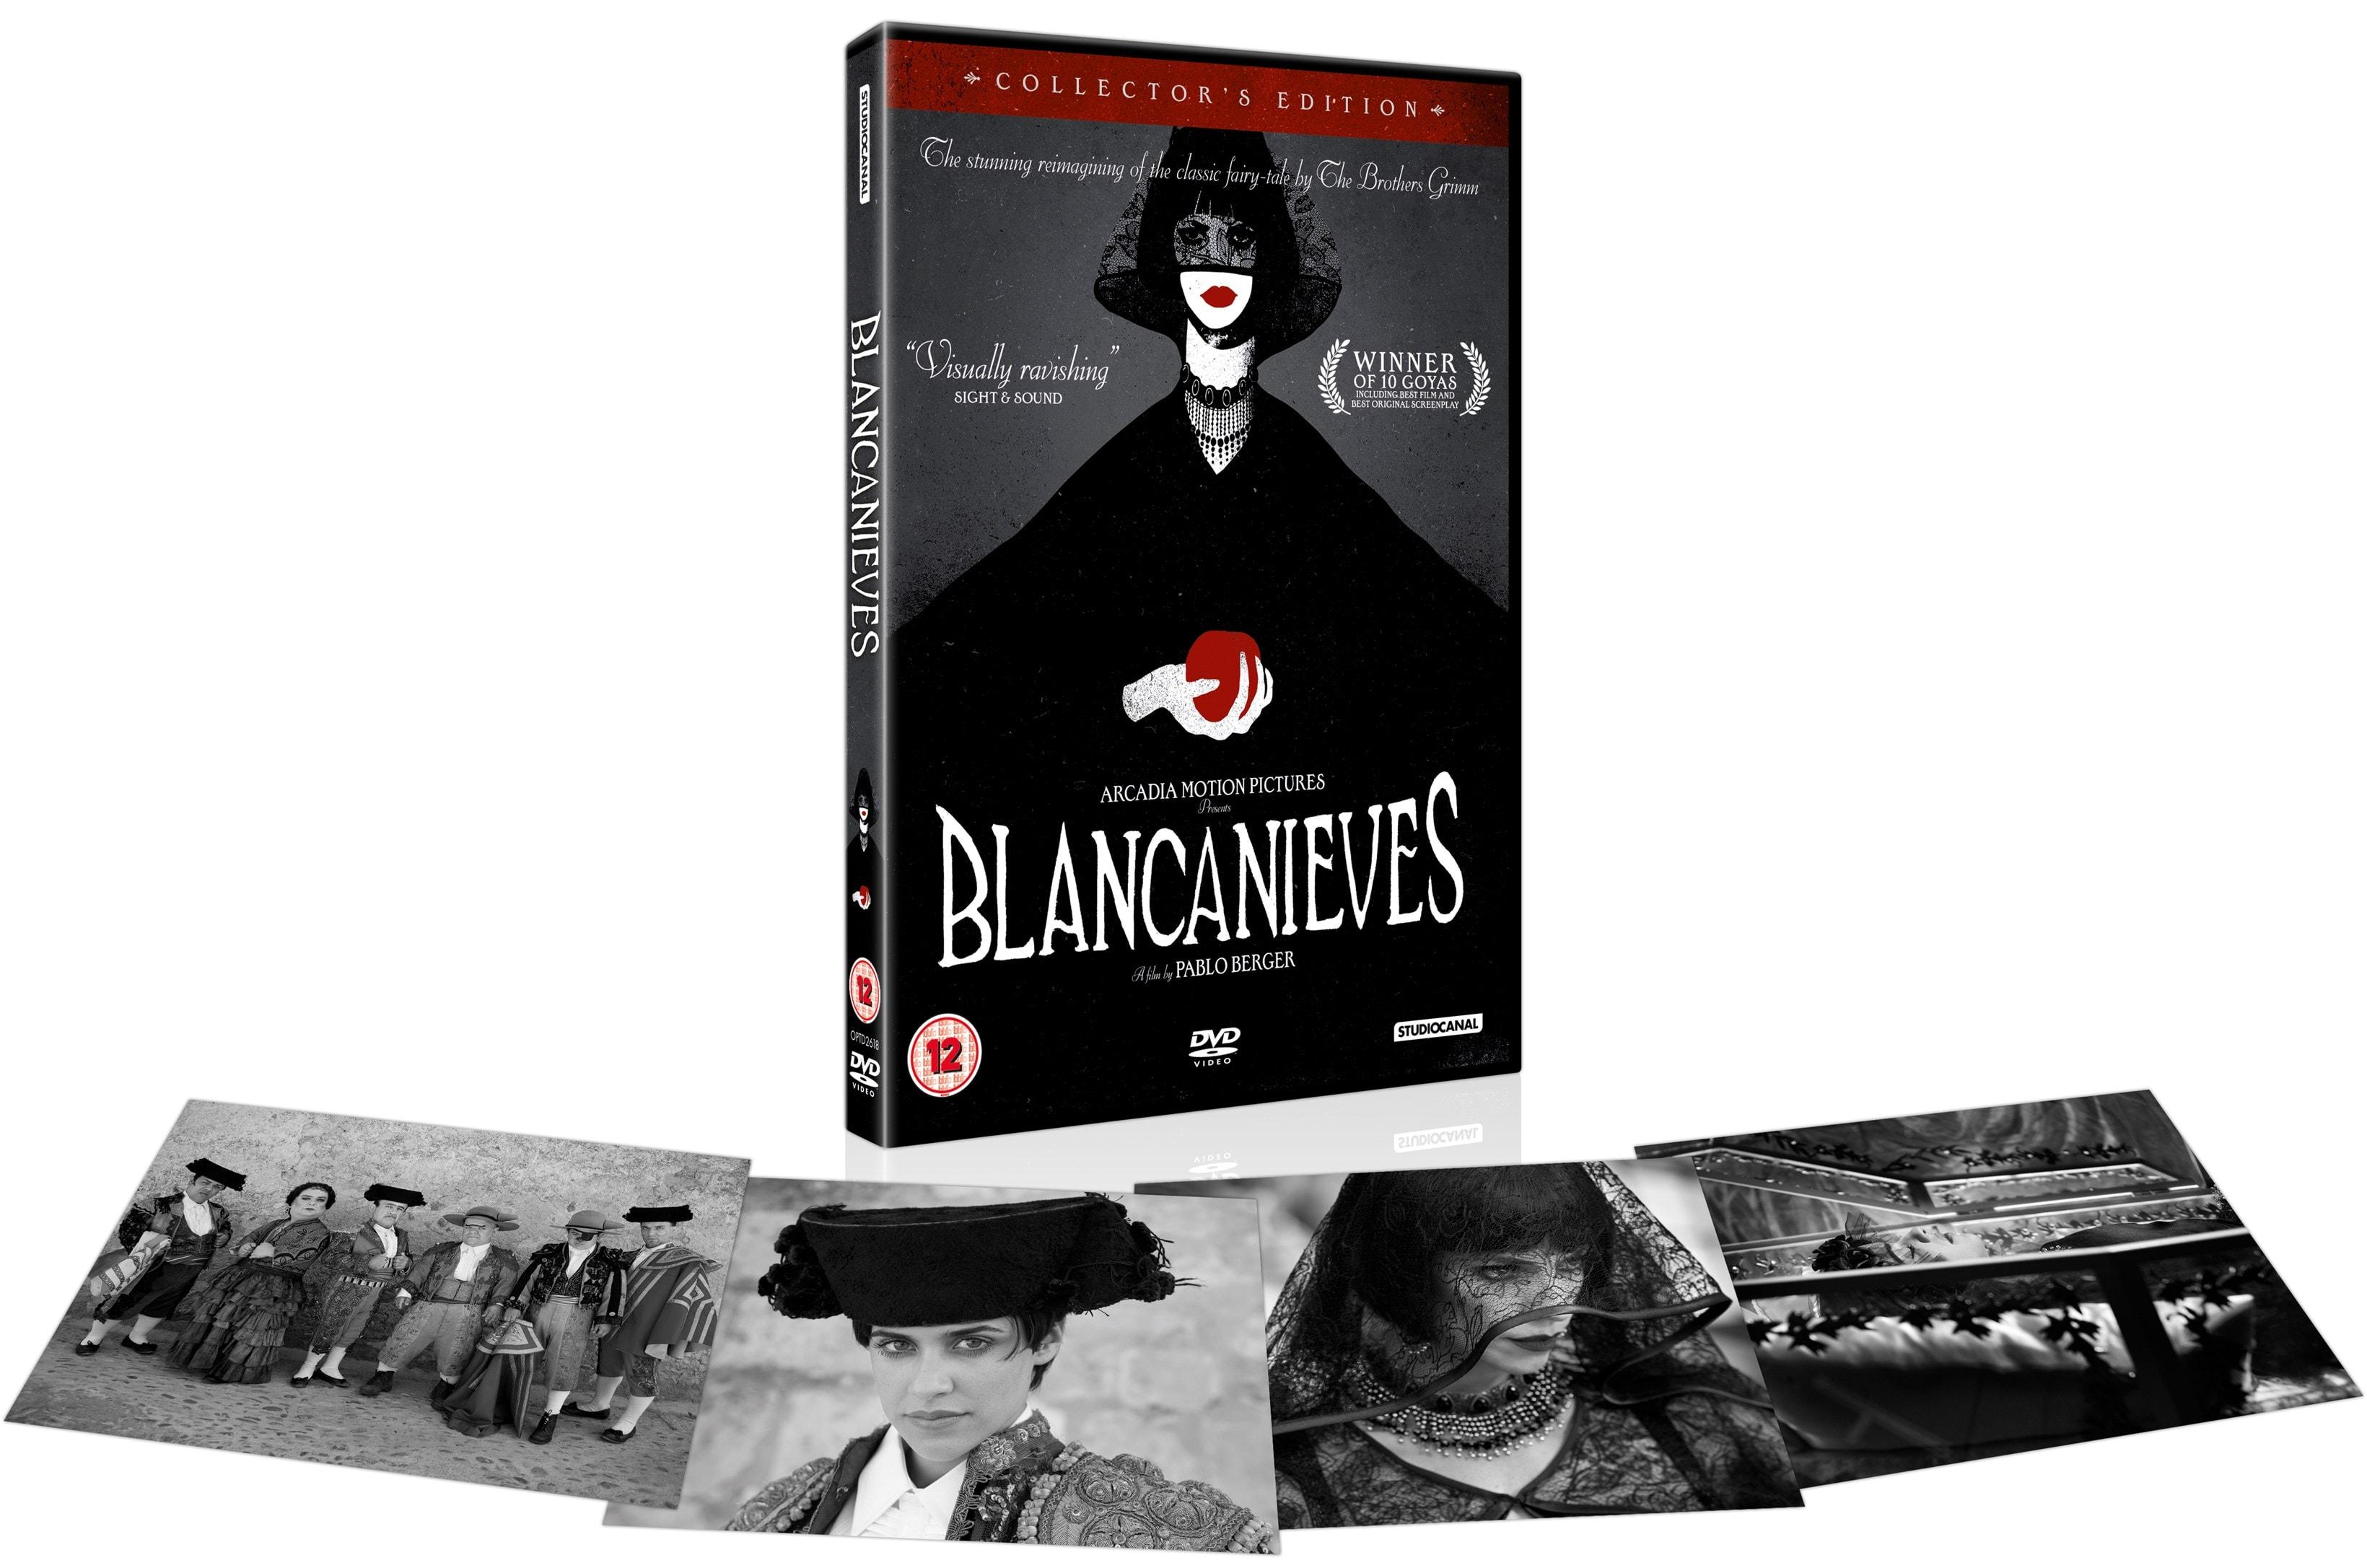 Blancanieves - 2